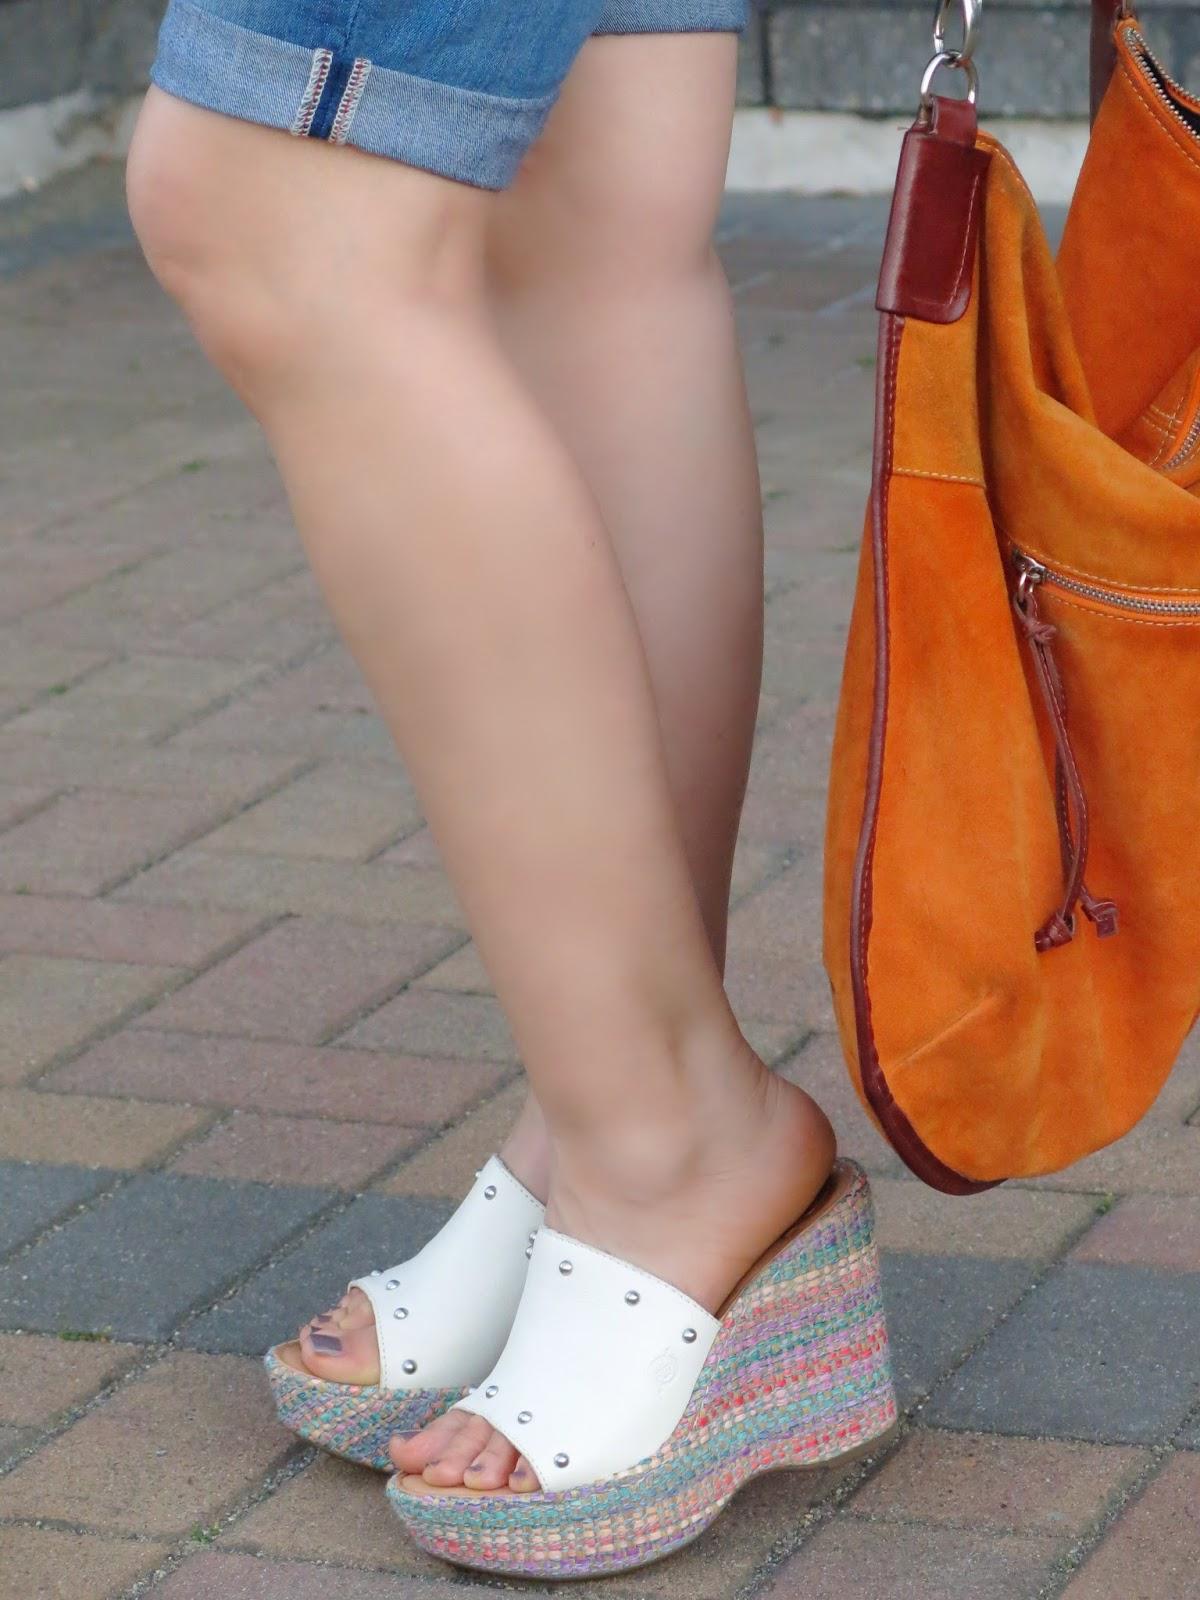 denim bermuda shorts, platform wedges, and orange suede bag